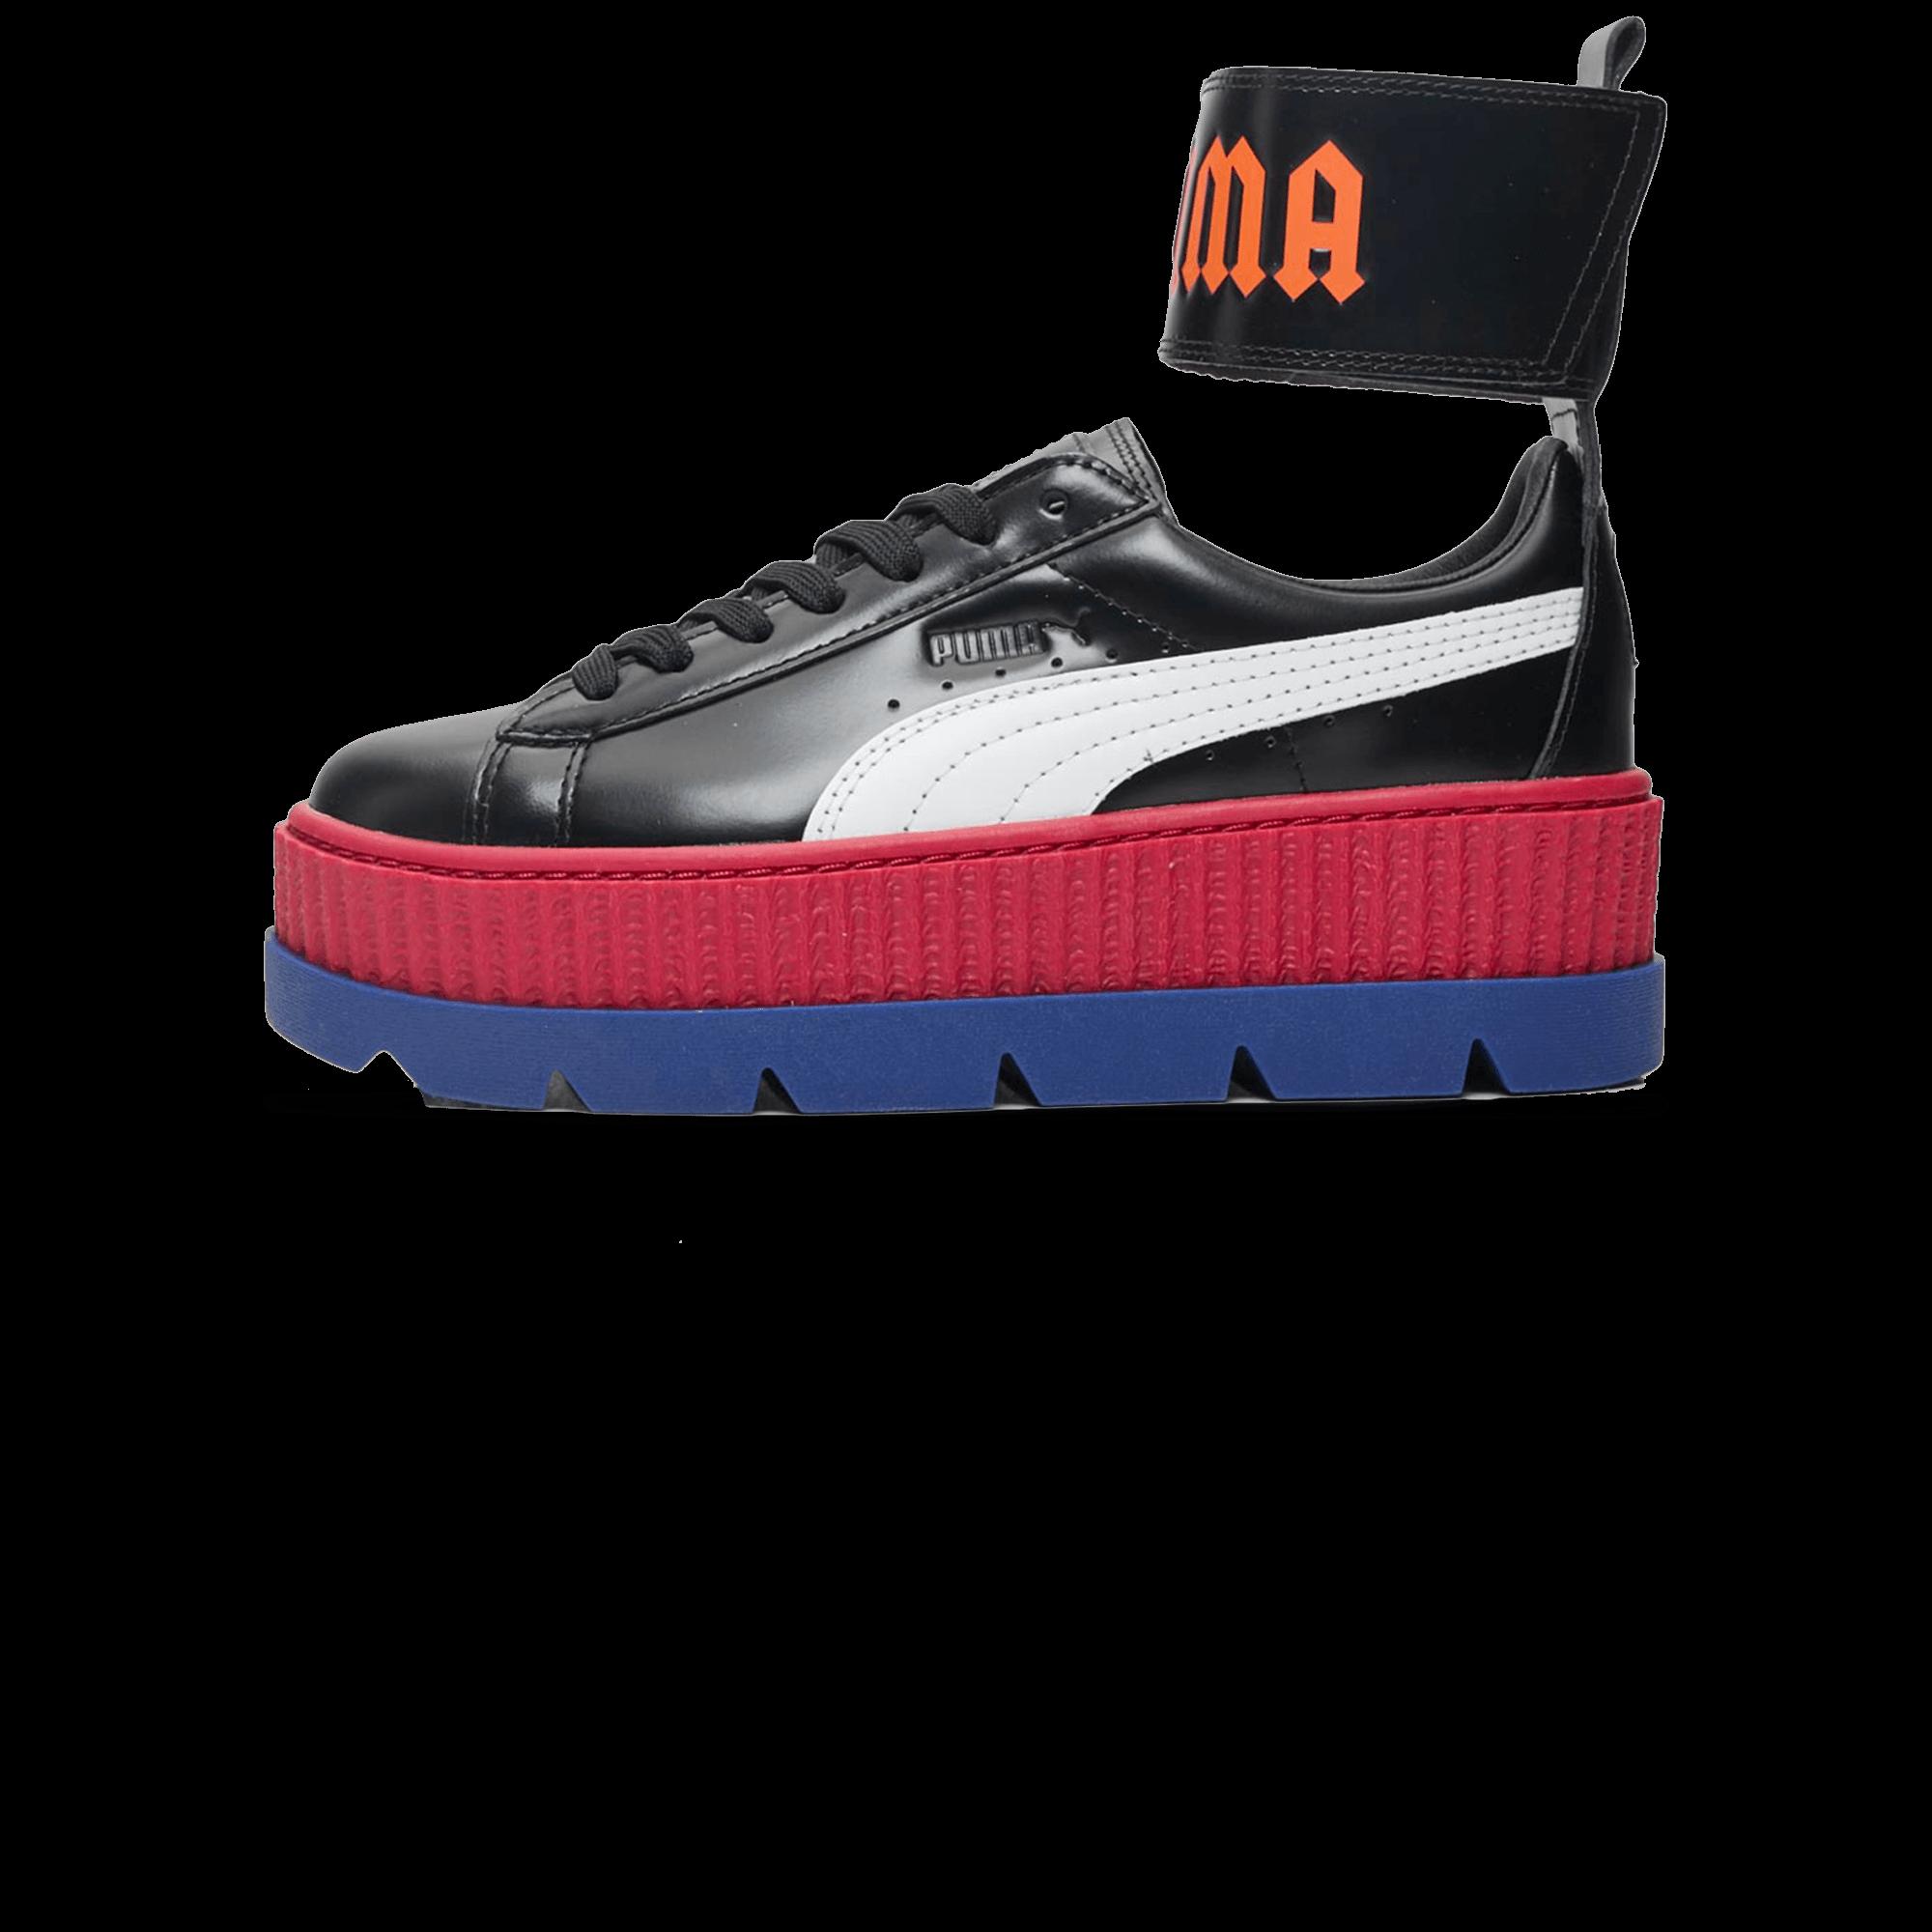 on sale 0a078 22550 Puma Fenty Ankle Strap black/red - Woman   Holypopstore.com